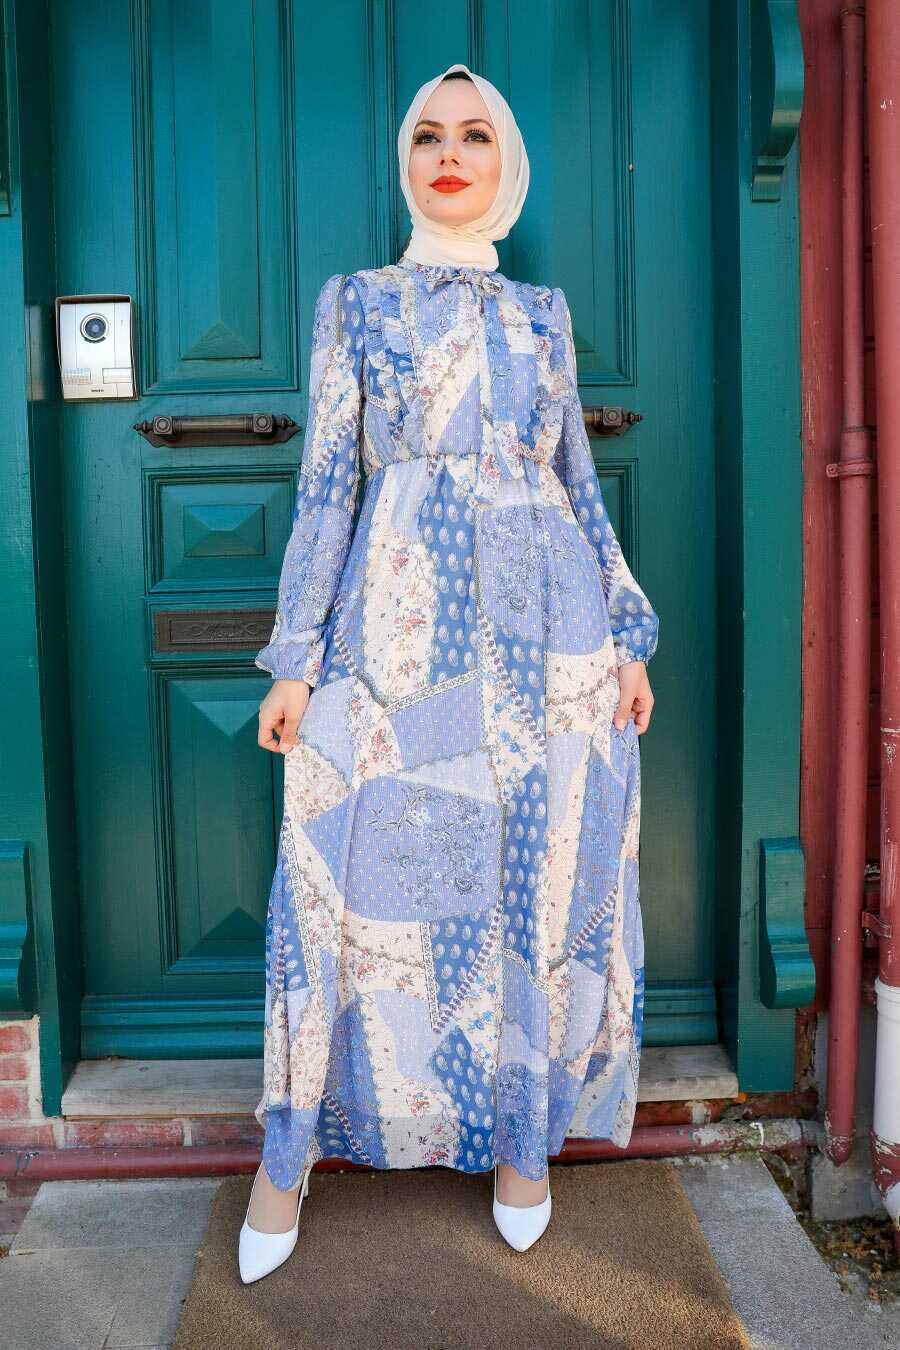 İndigo Blue Hijab Dress 2957IM